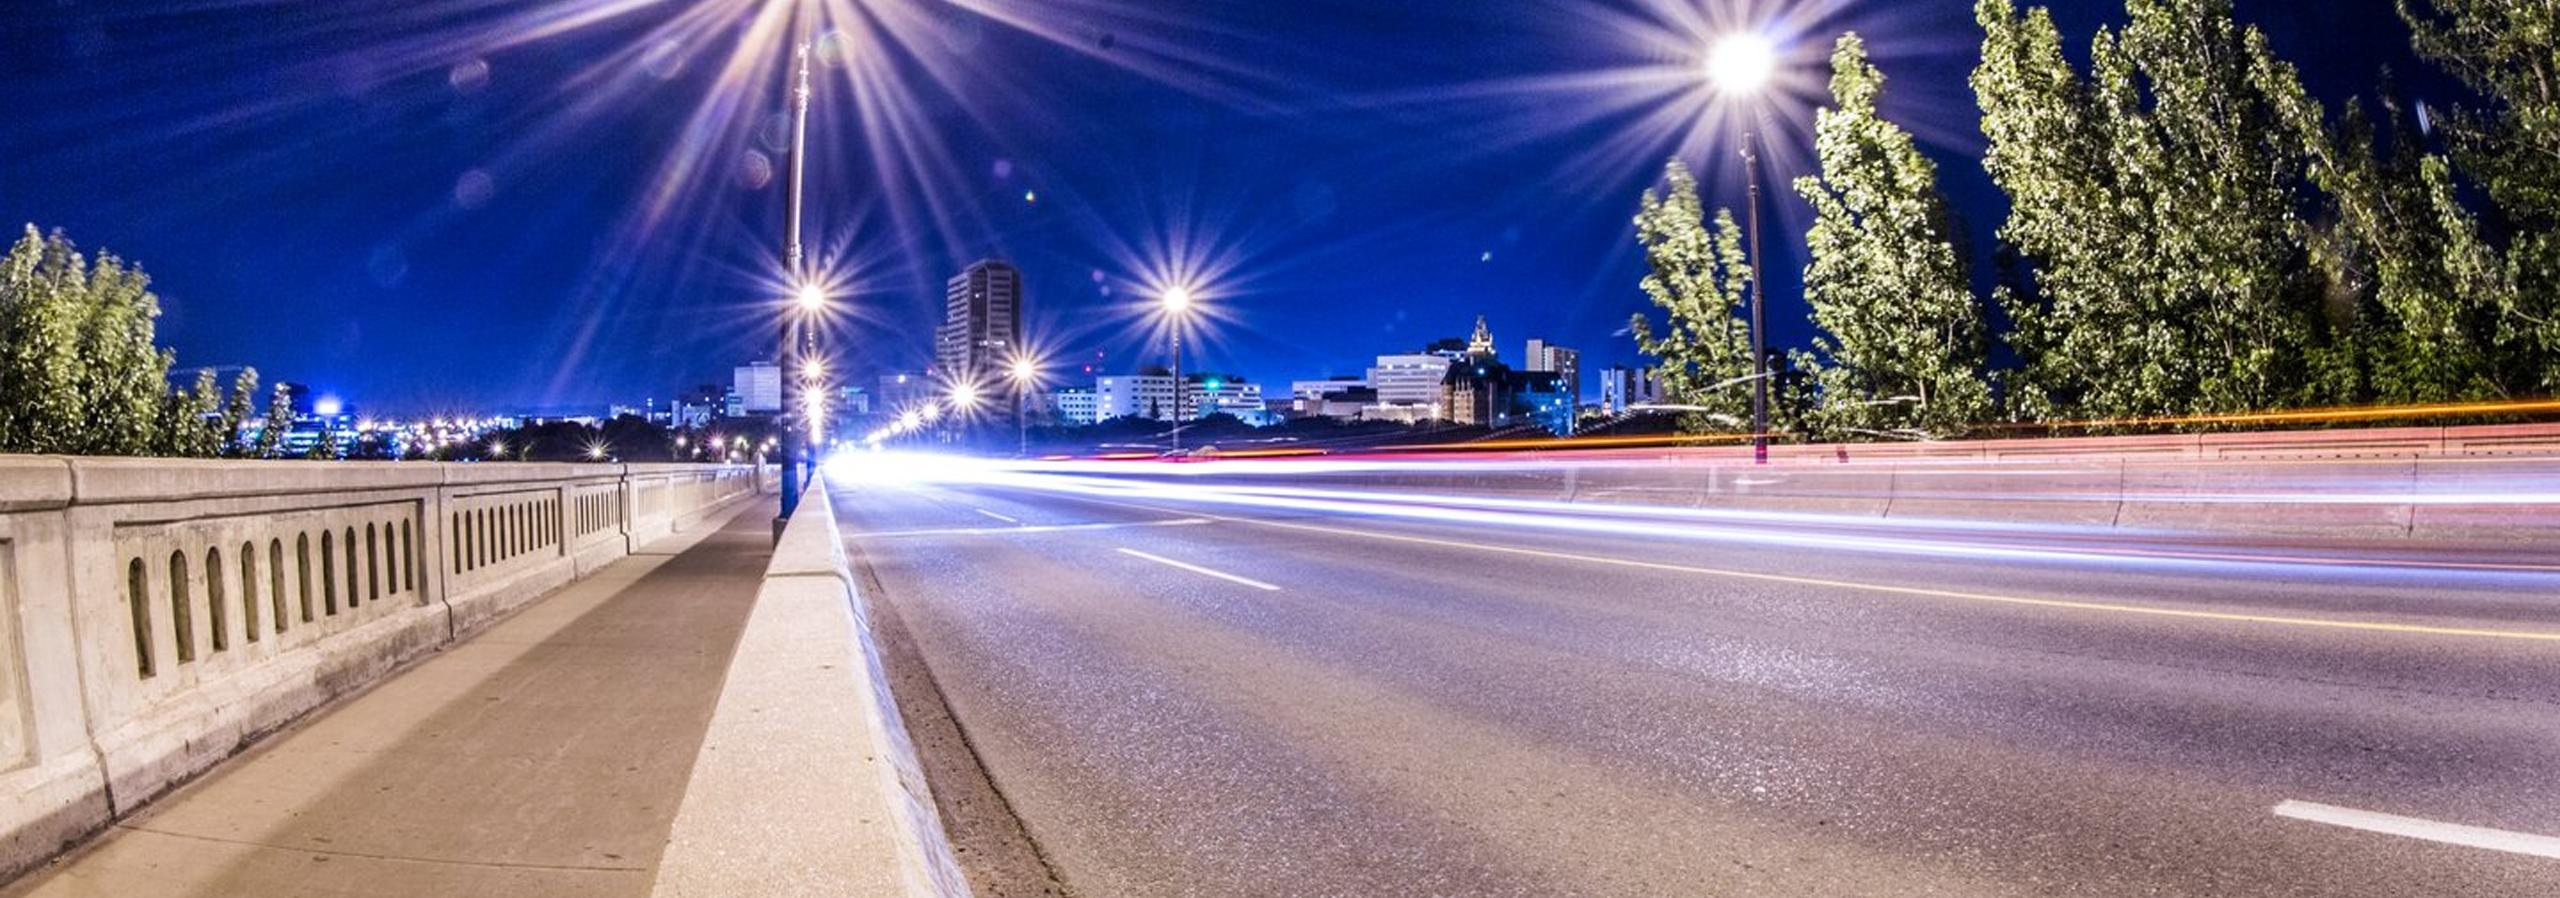 Travel to Saskatoon | Transportation, Directions & Maps on